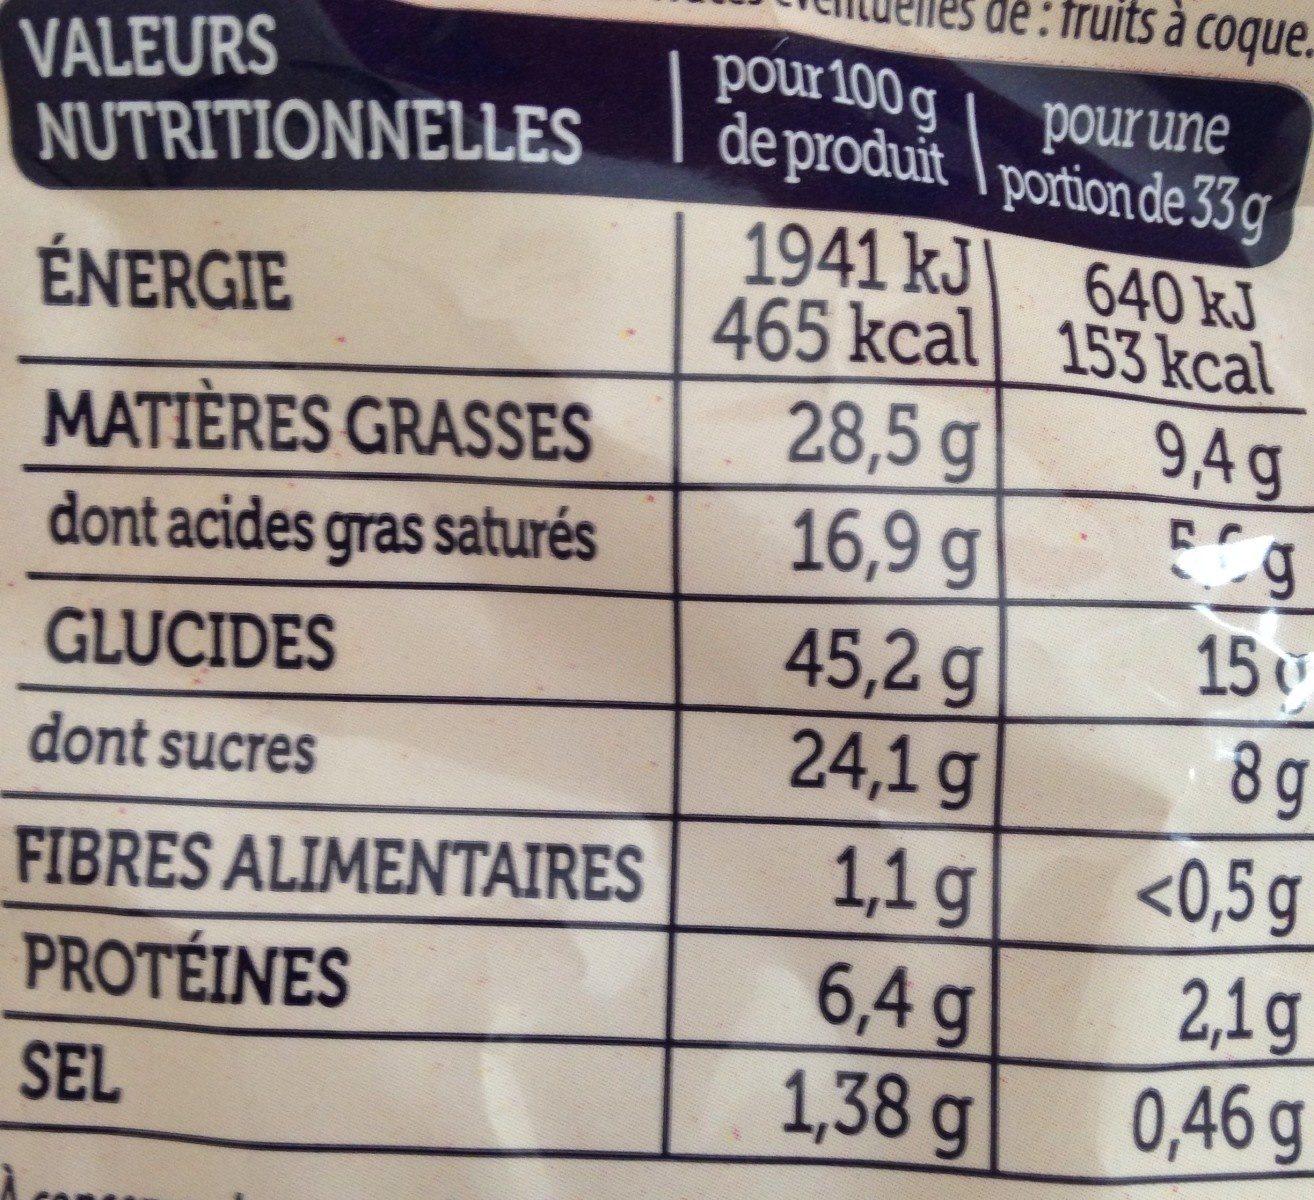 Madeleines Bretonnes Pur Beurre - Informations nutritionnelles - fr